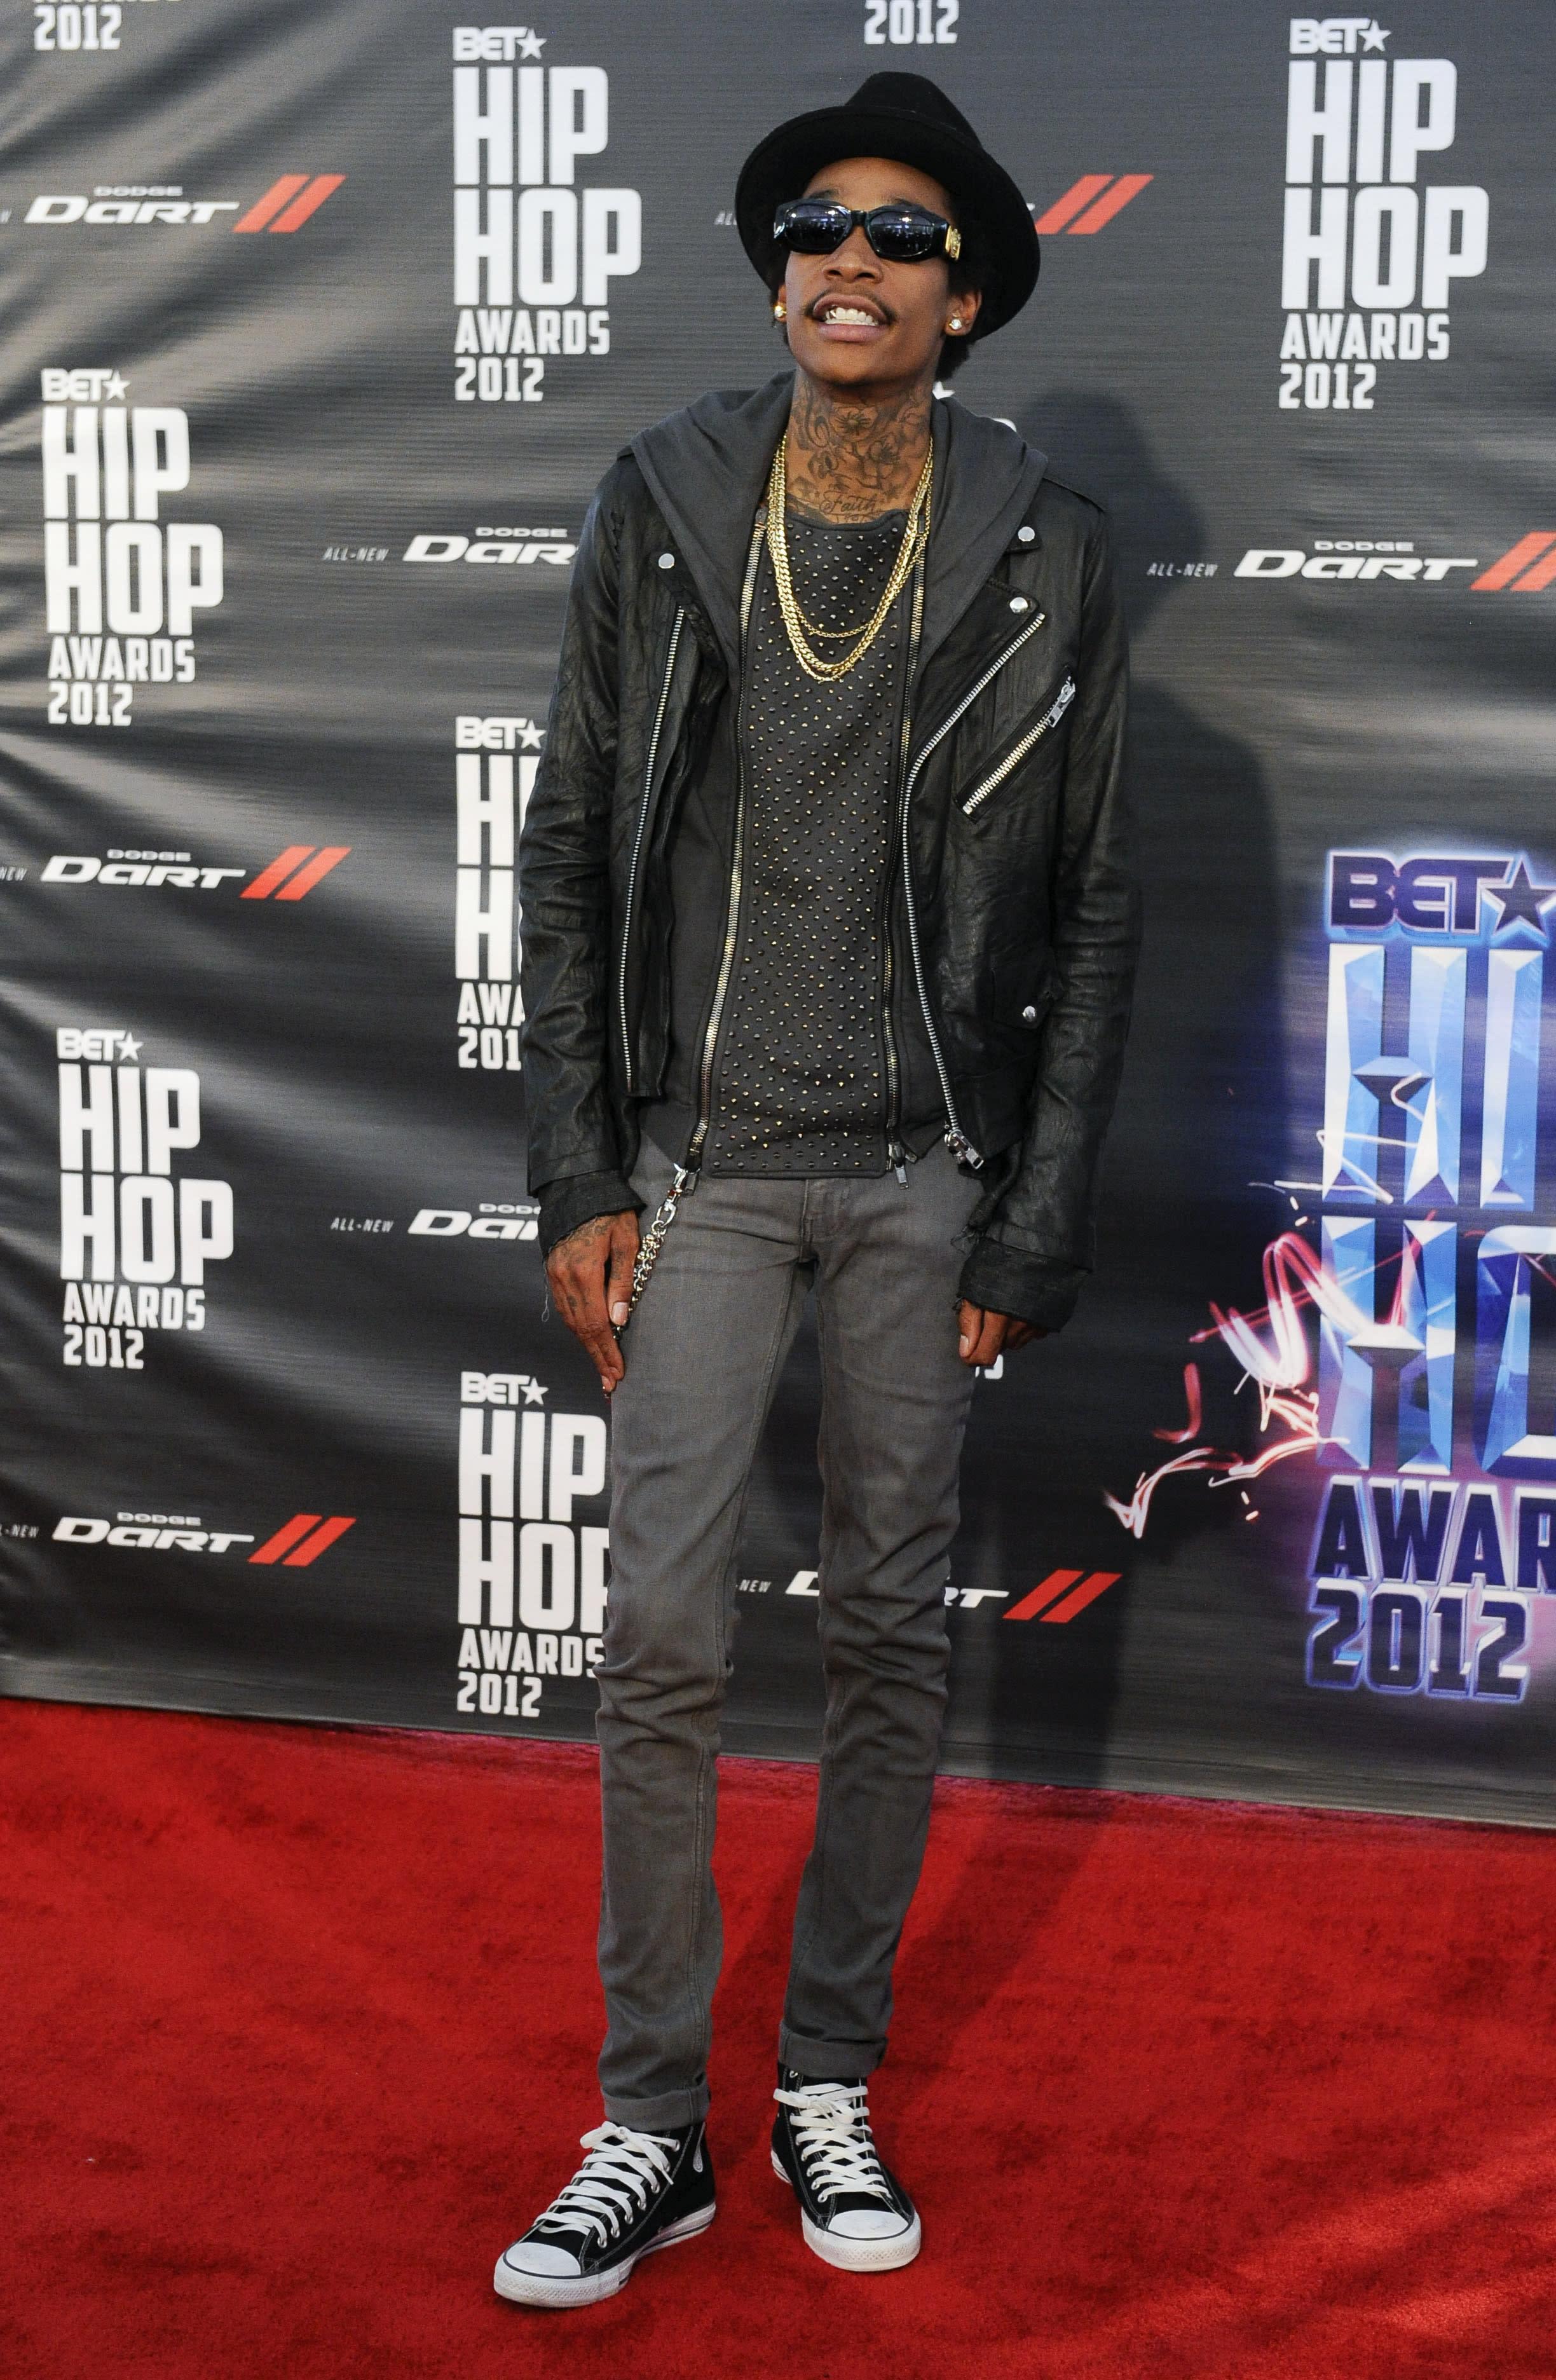 Wiz Khalifa attends the BET Hip-Hop Honors at Boisfeuillet Jones Atlanta Civic Center on Saturday, Sept. 29, 2012, in Atlanta. (Photo by John Amis/Invision/AP)